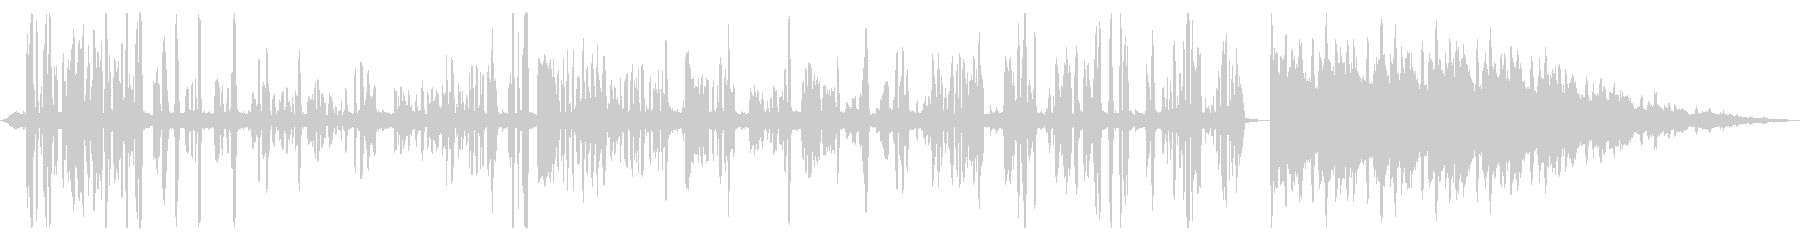 BGM向けミキシング解説動画 vol.1の未再生の波形